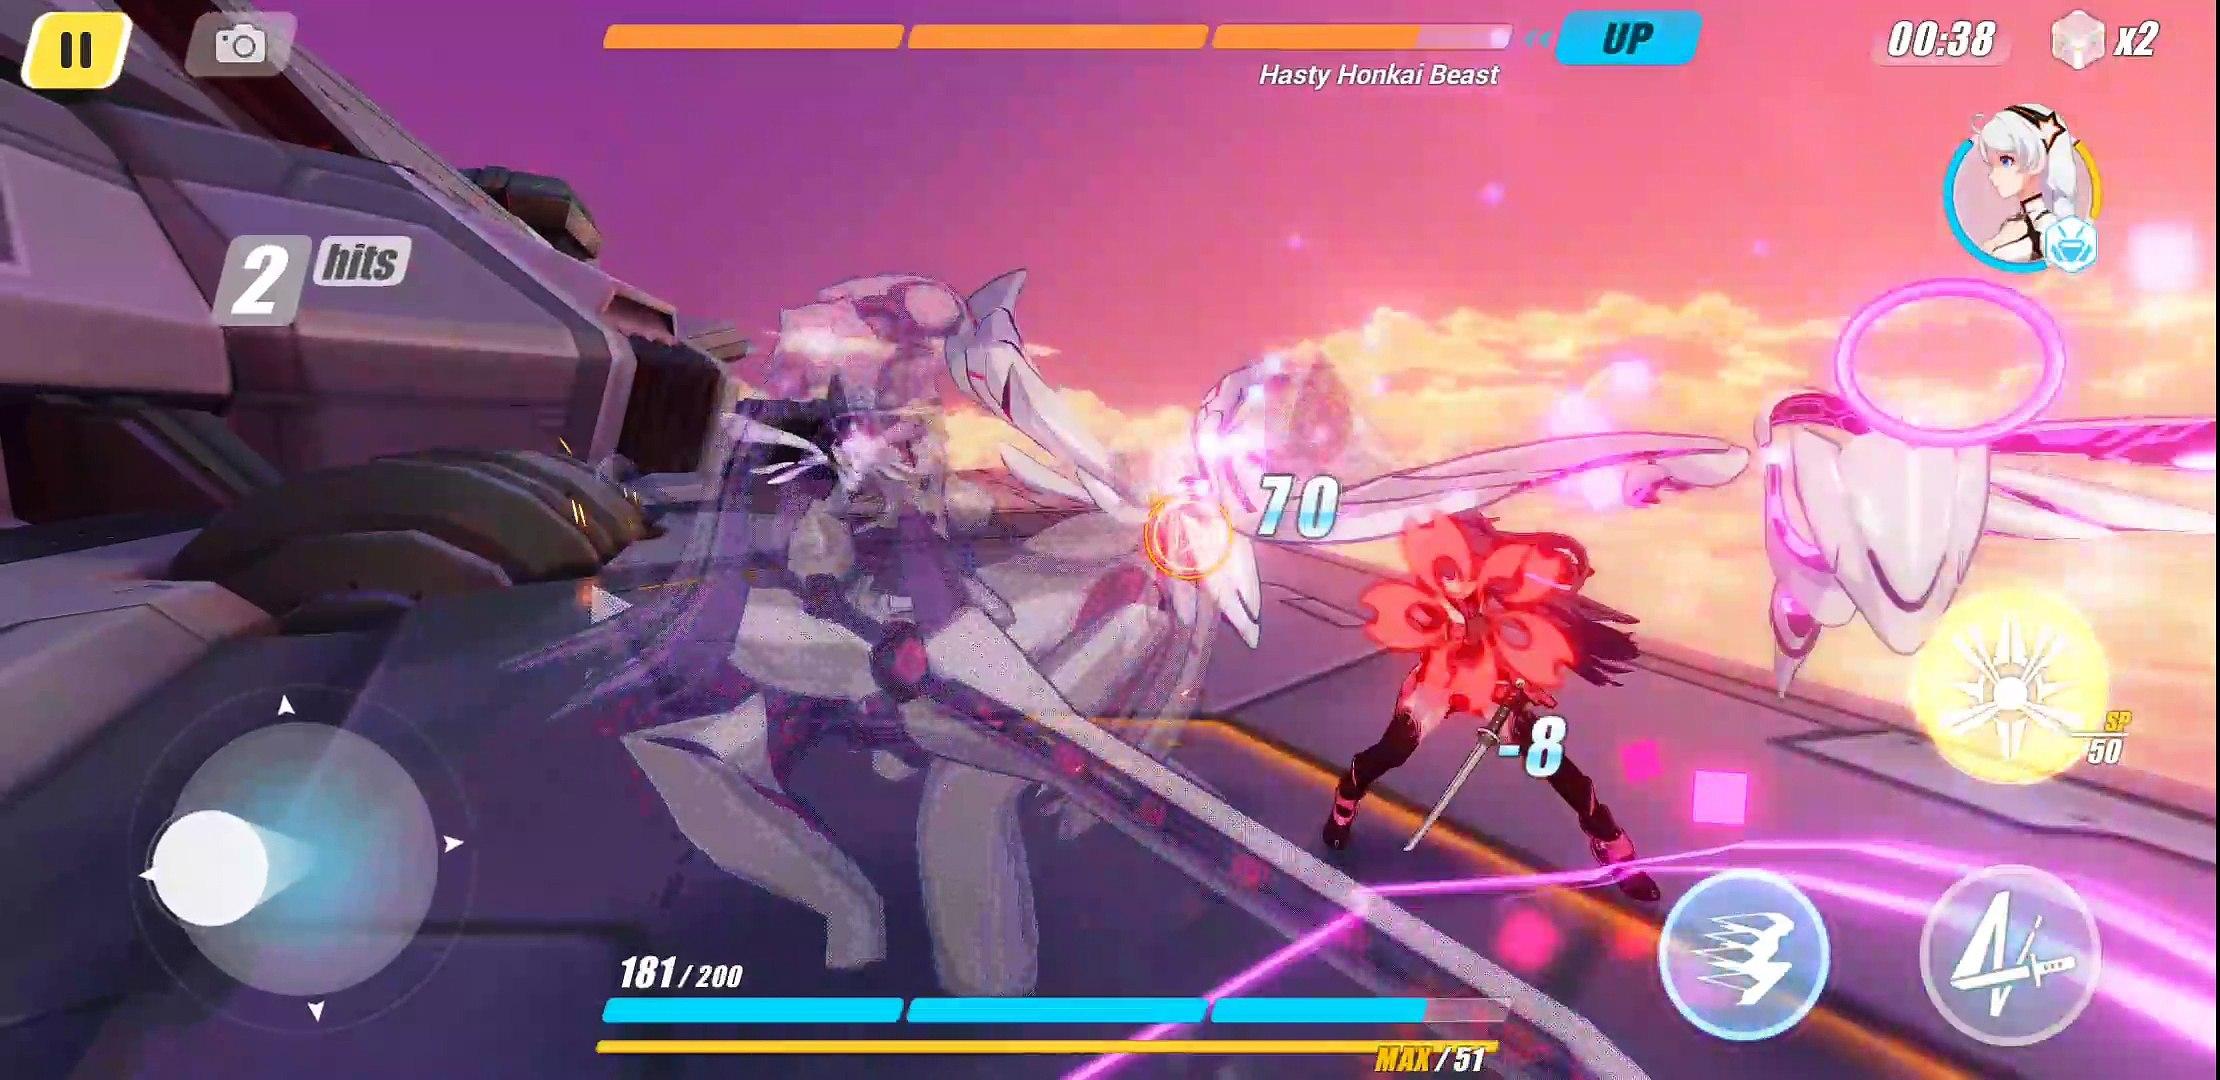 Honkai Impact 3 PC คมชัด ท้าให้ลอง2